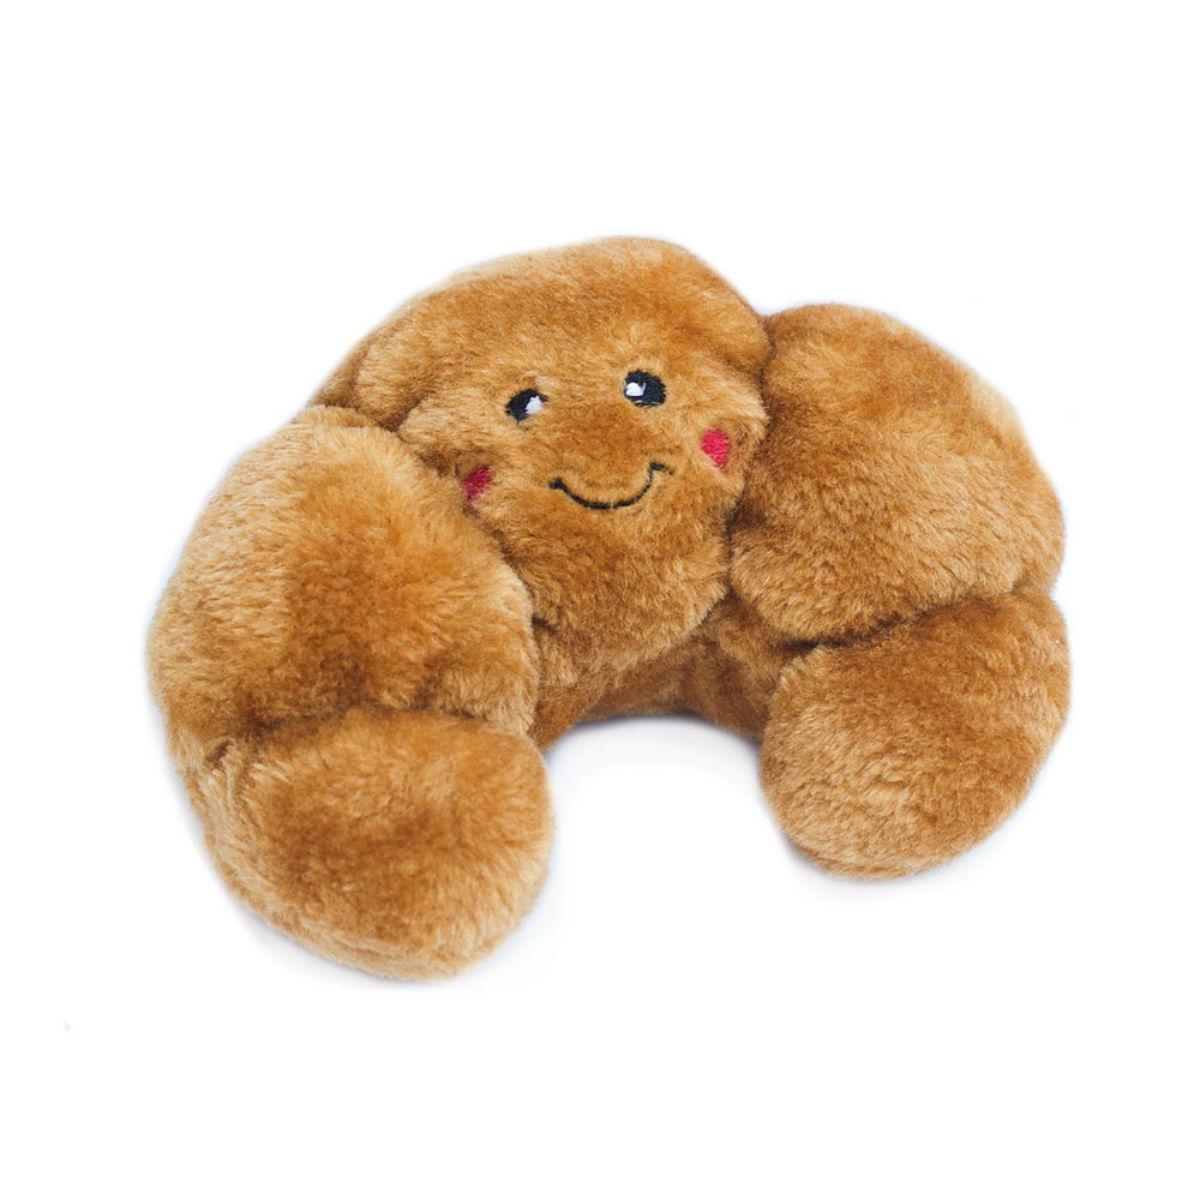 ZippyPaws NomNomz Dog Toy - Croissant